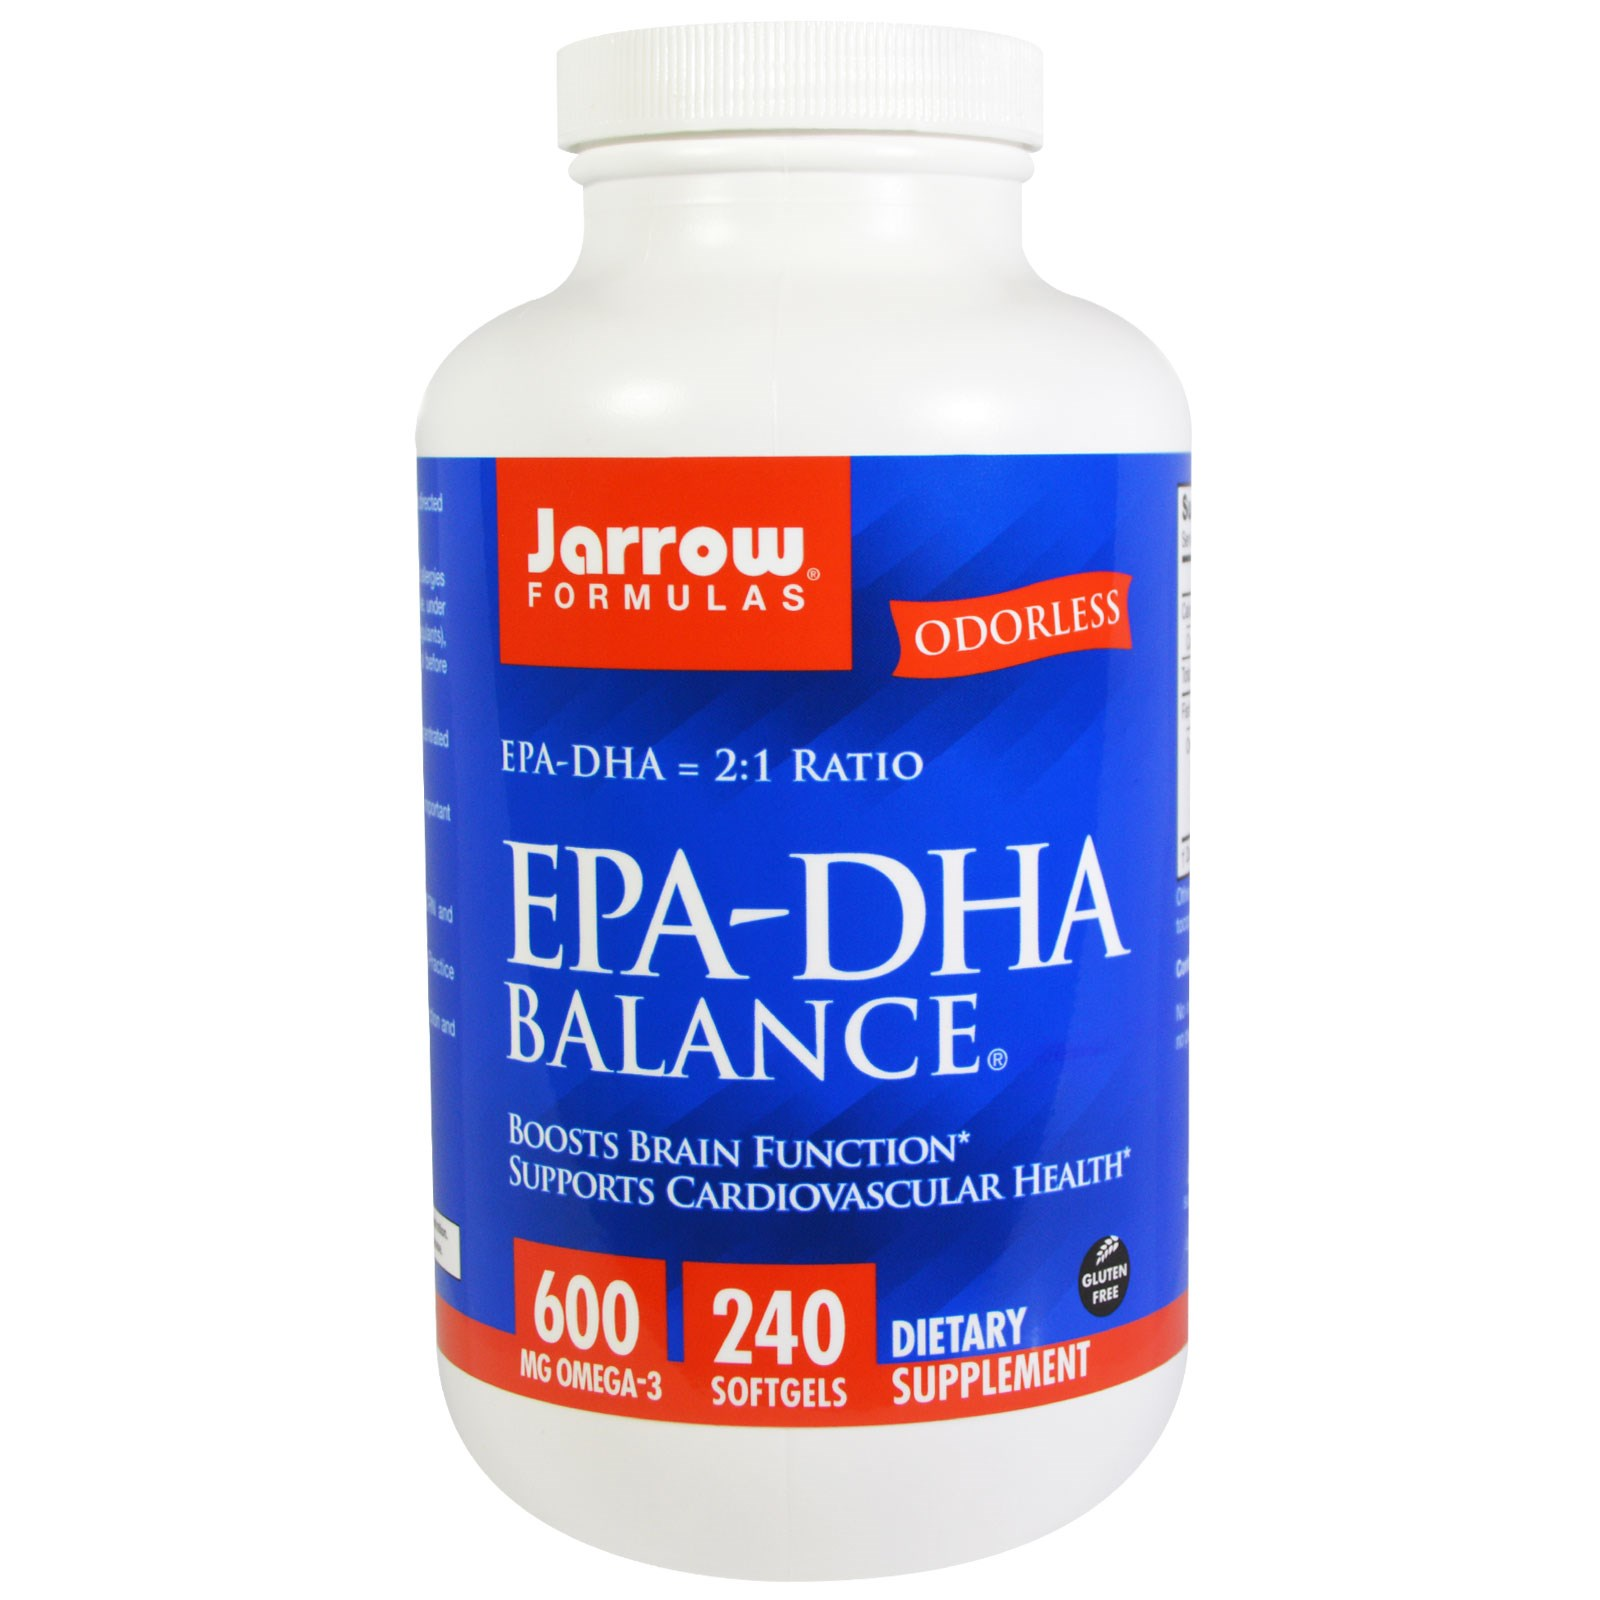 Image of EPA-DHA Balance (240 Softgels) - Jarrow Formulas 0790011160397